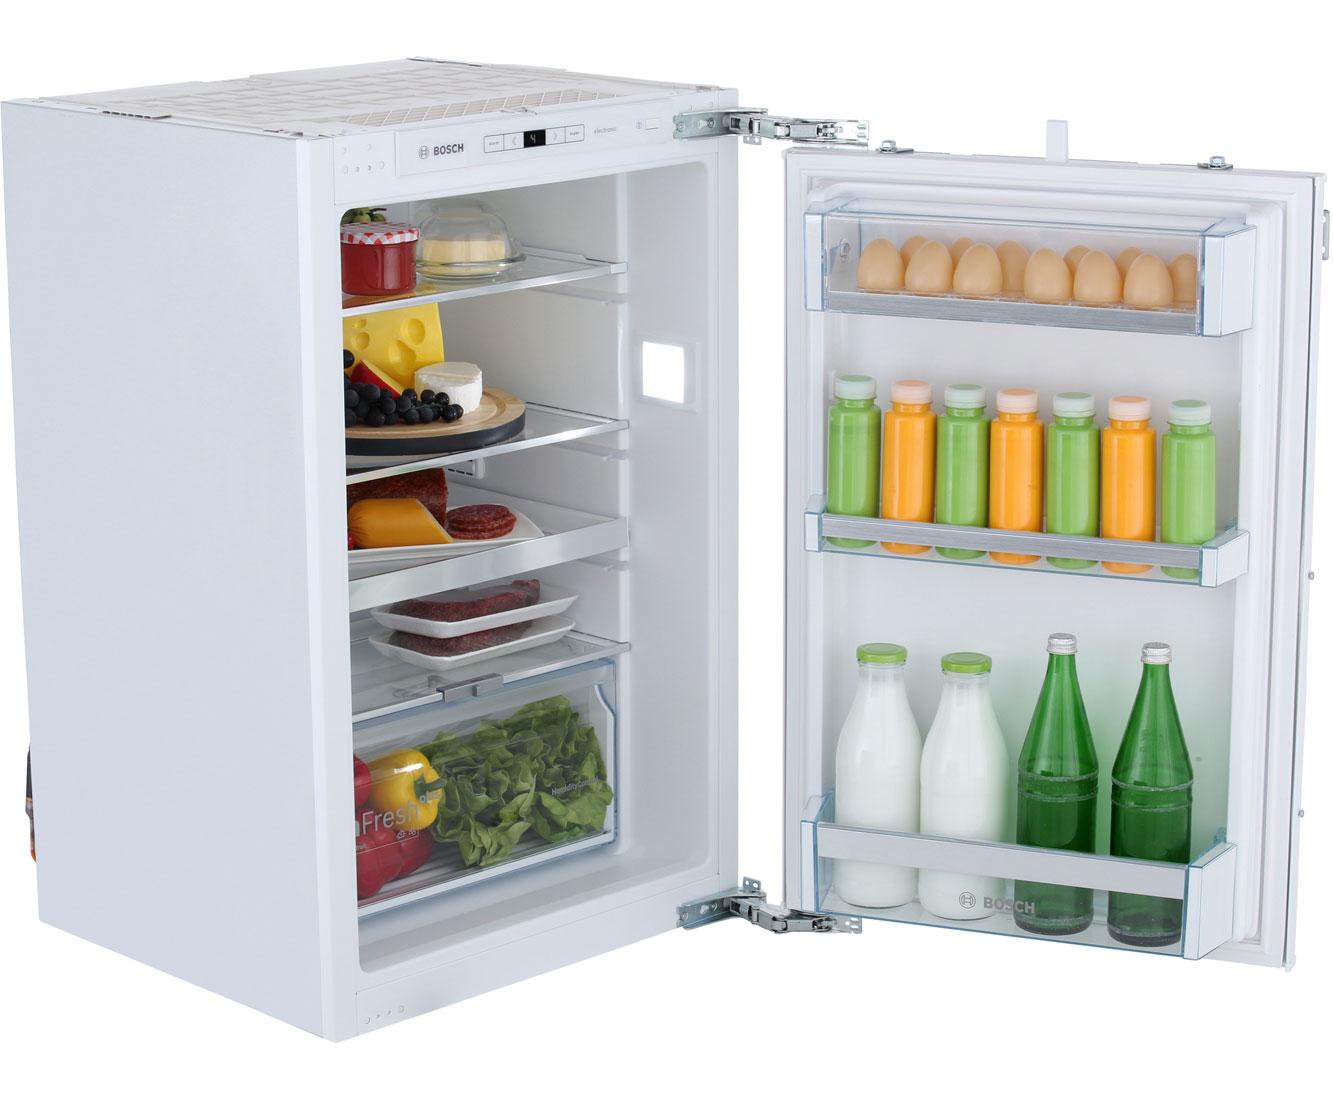 Bosch Cooler Kühlschrank : Bosch serie kir ad einbau kühlschrank er nische festtür